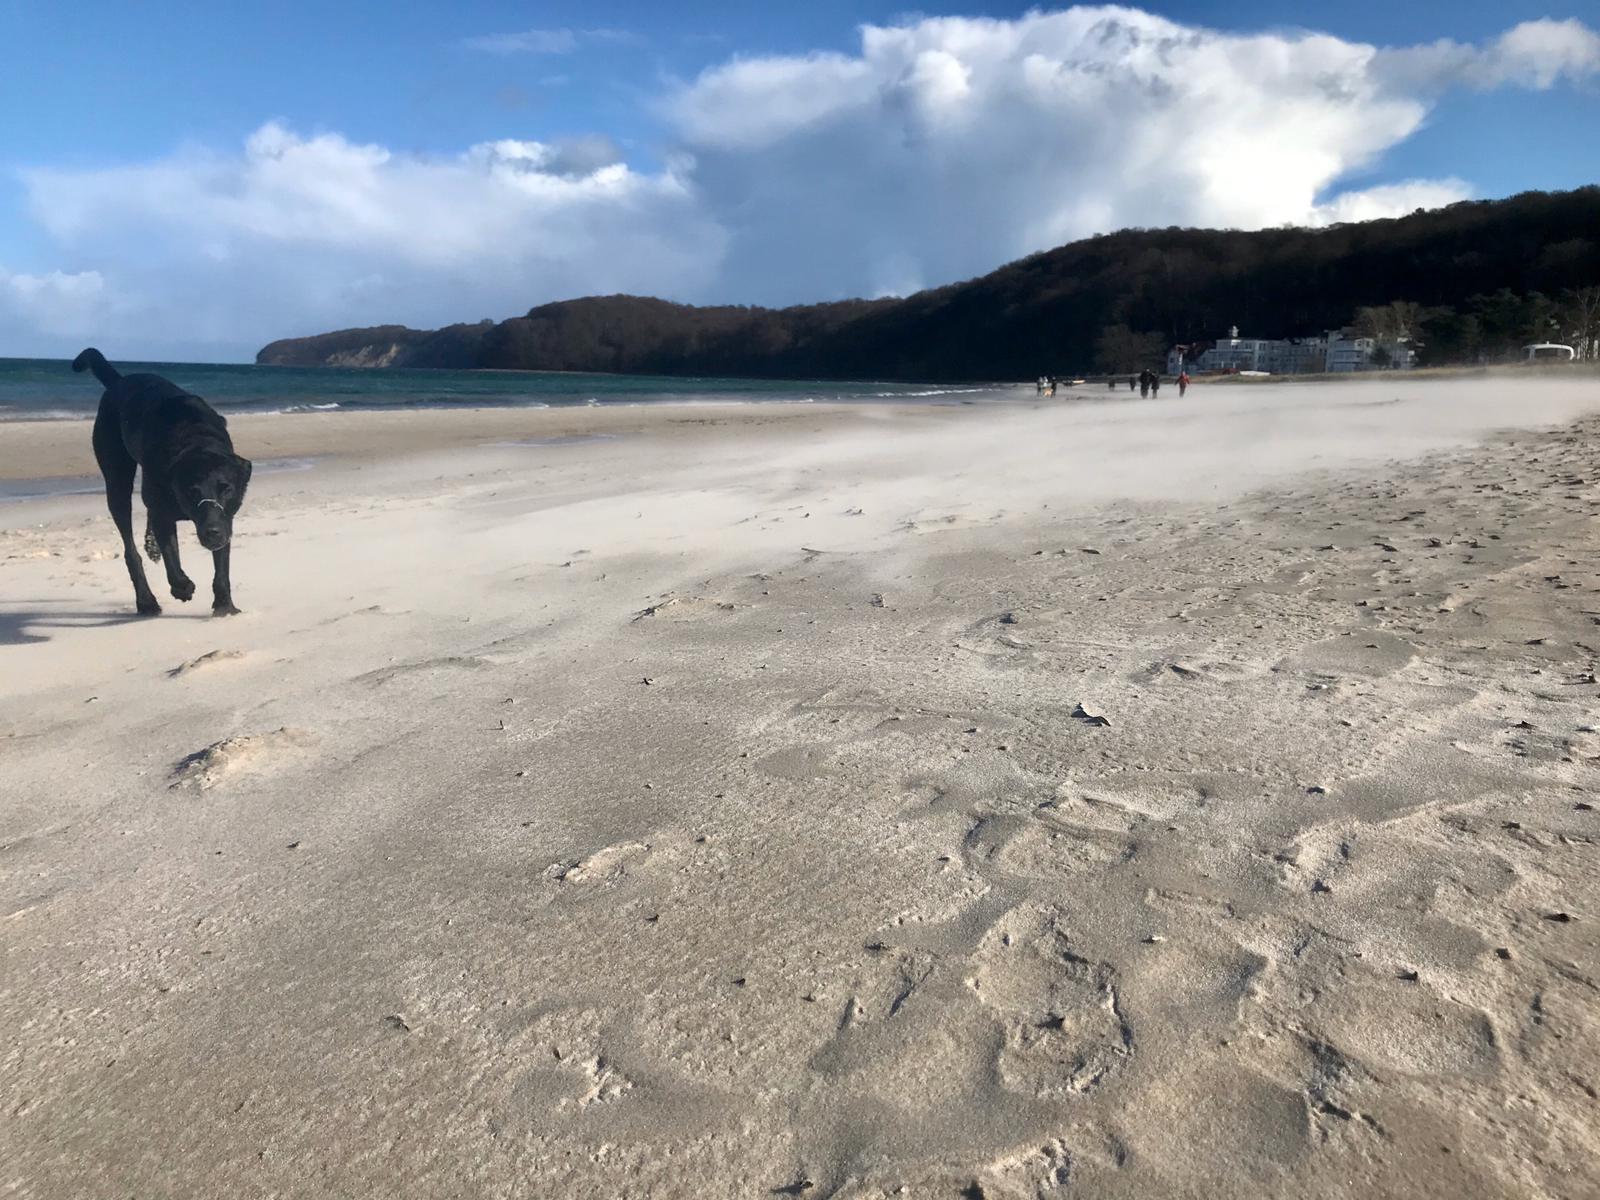 Rügen Strandspaziergang in der Nebensaison